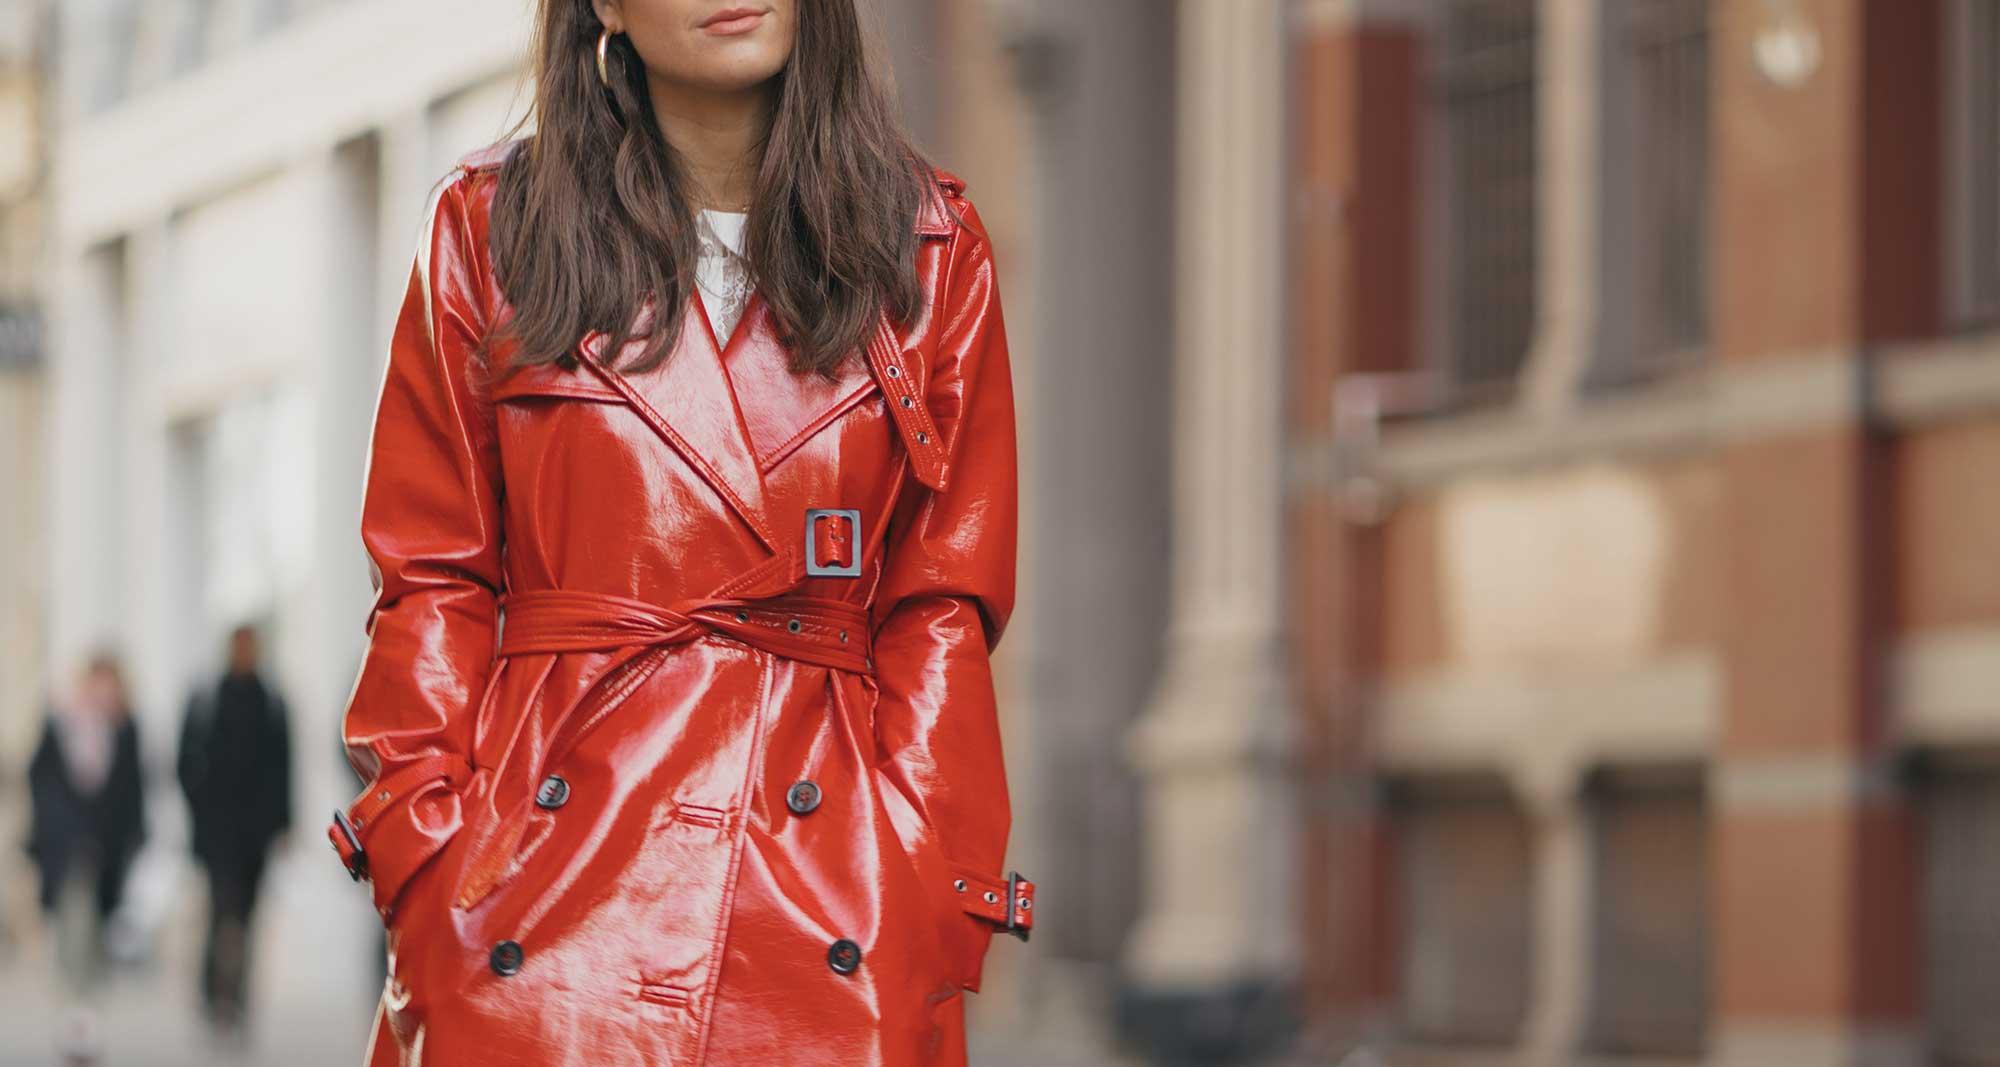 For-Love-and-Lemons-La-Zosia-Midi-Dress-Sheer-lace-sequin-heart-applique1.jpg